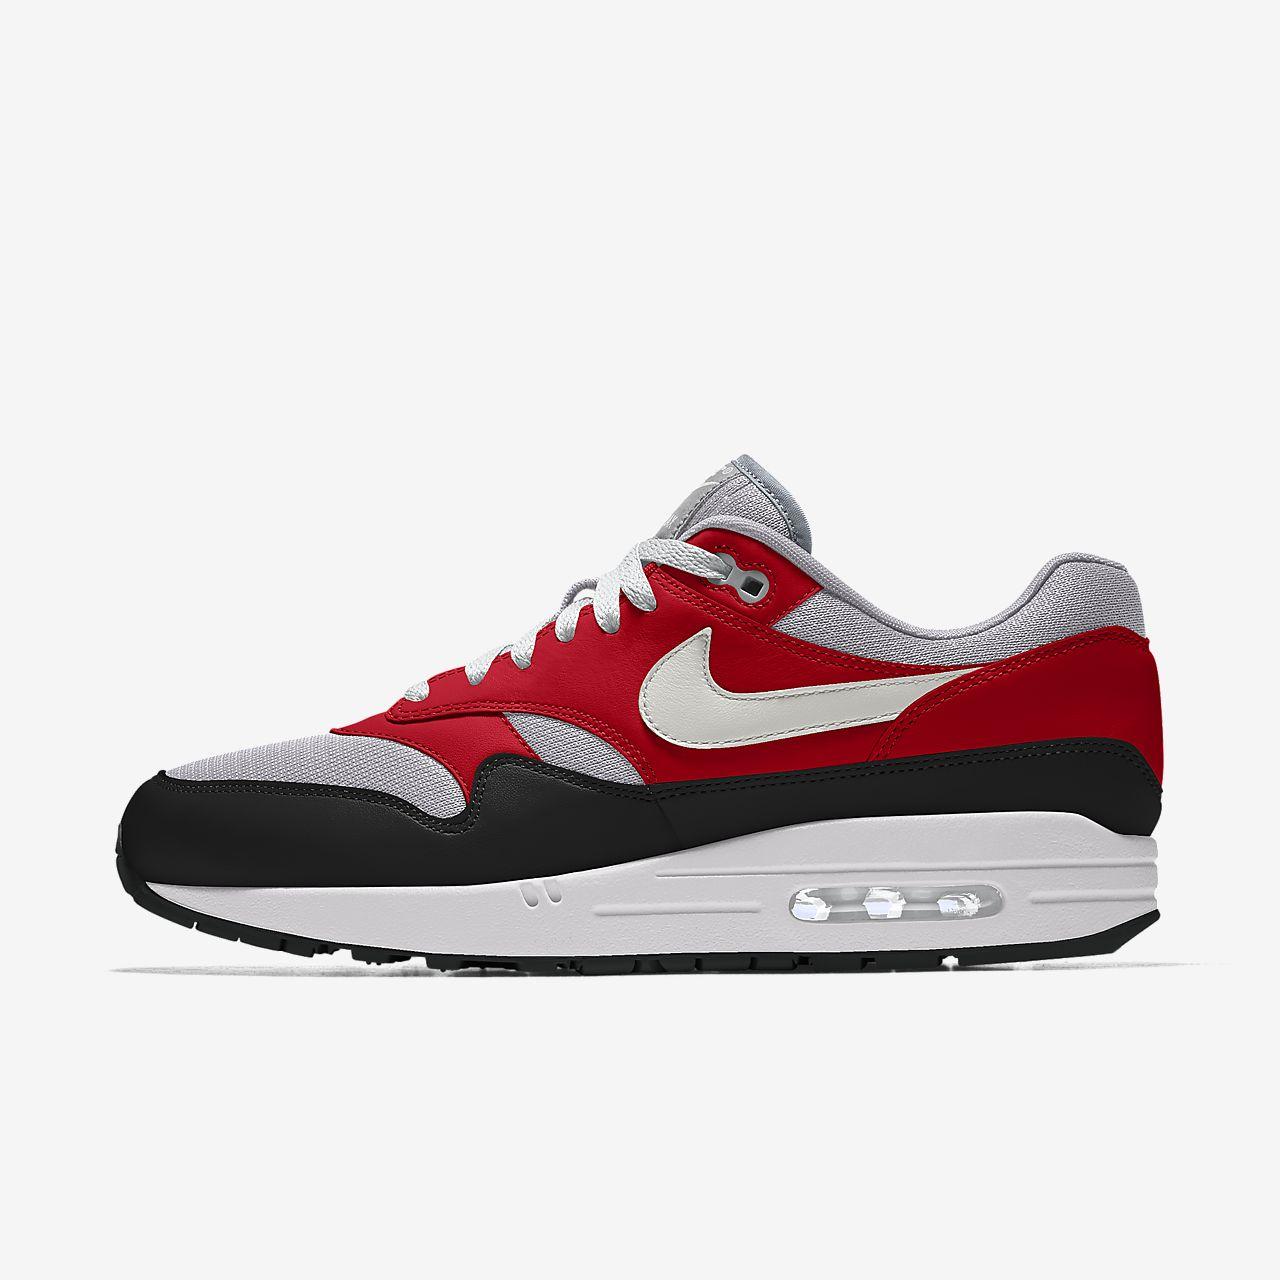 Nike Air Max 1 By You personalisierbarer Herrenschuh